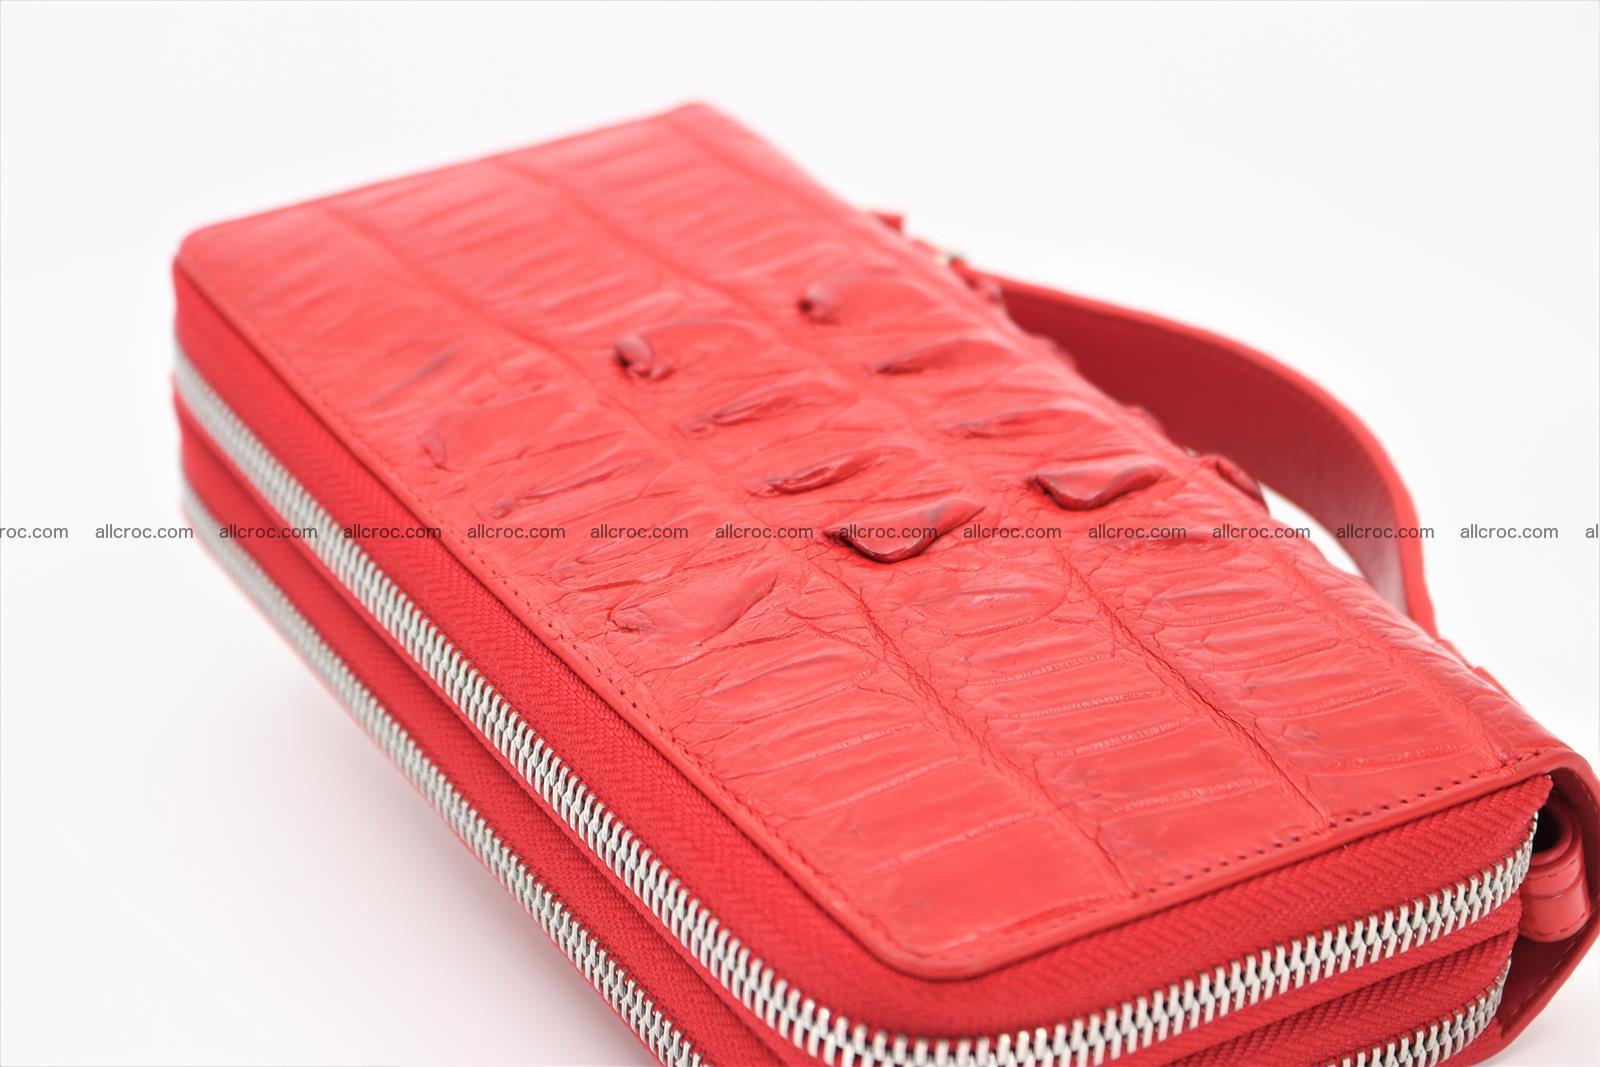 Crocodile skin clutch red color 2 zips 1263 Foto 2